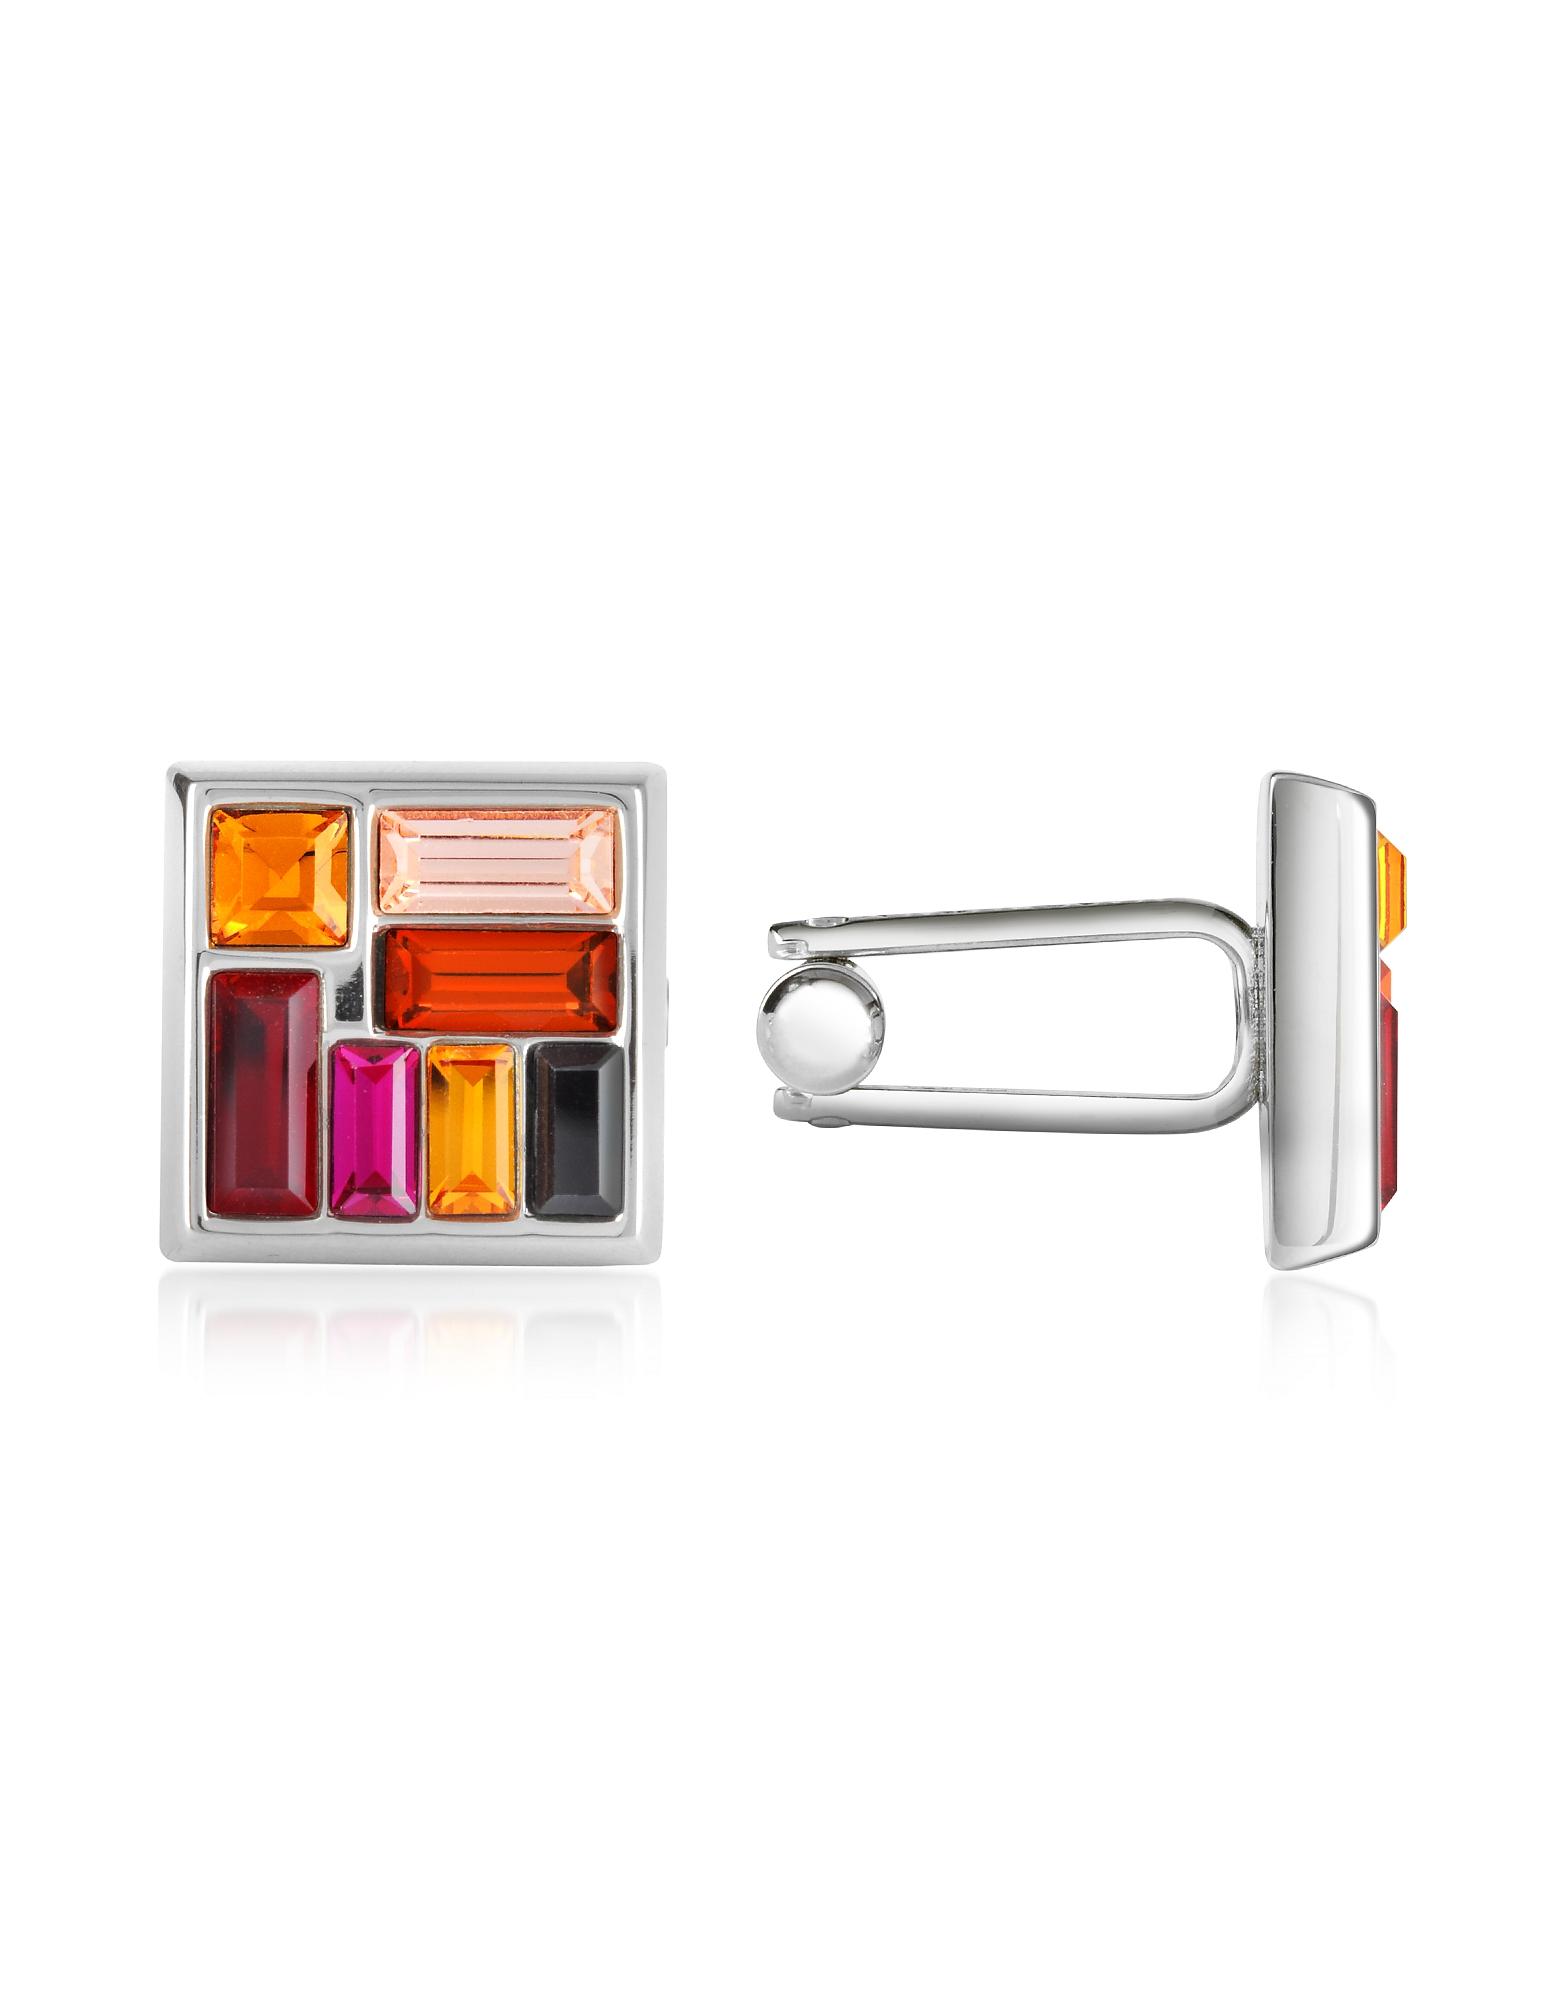 Forzieri Cufflinks, Multicolor Crystal Silver Plated Cufflinks